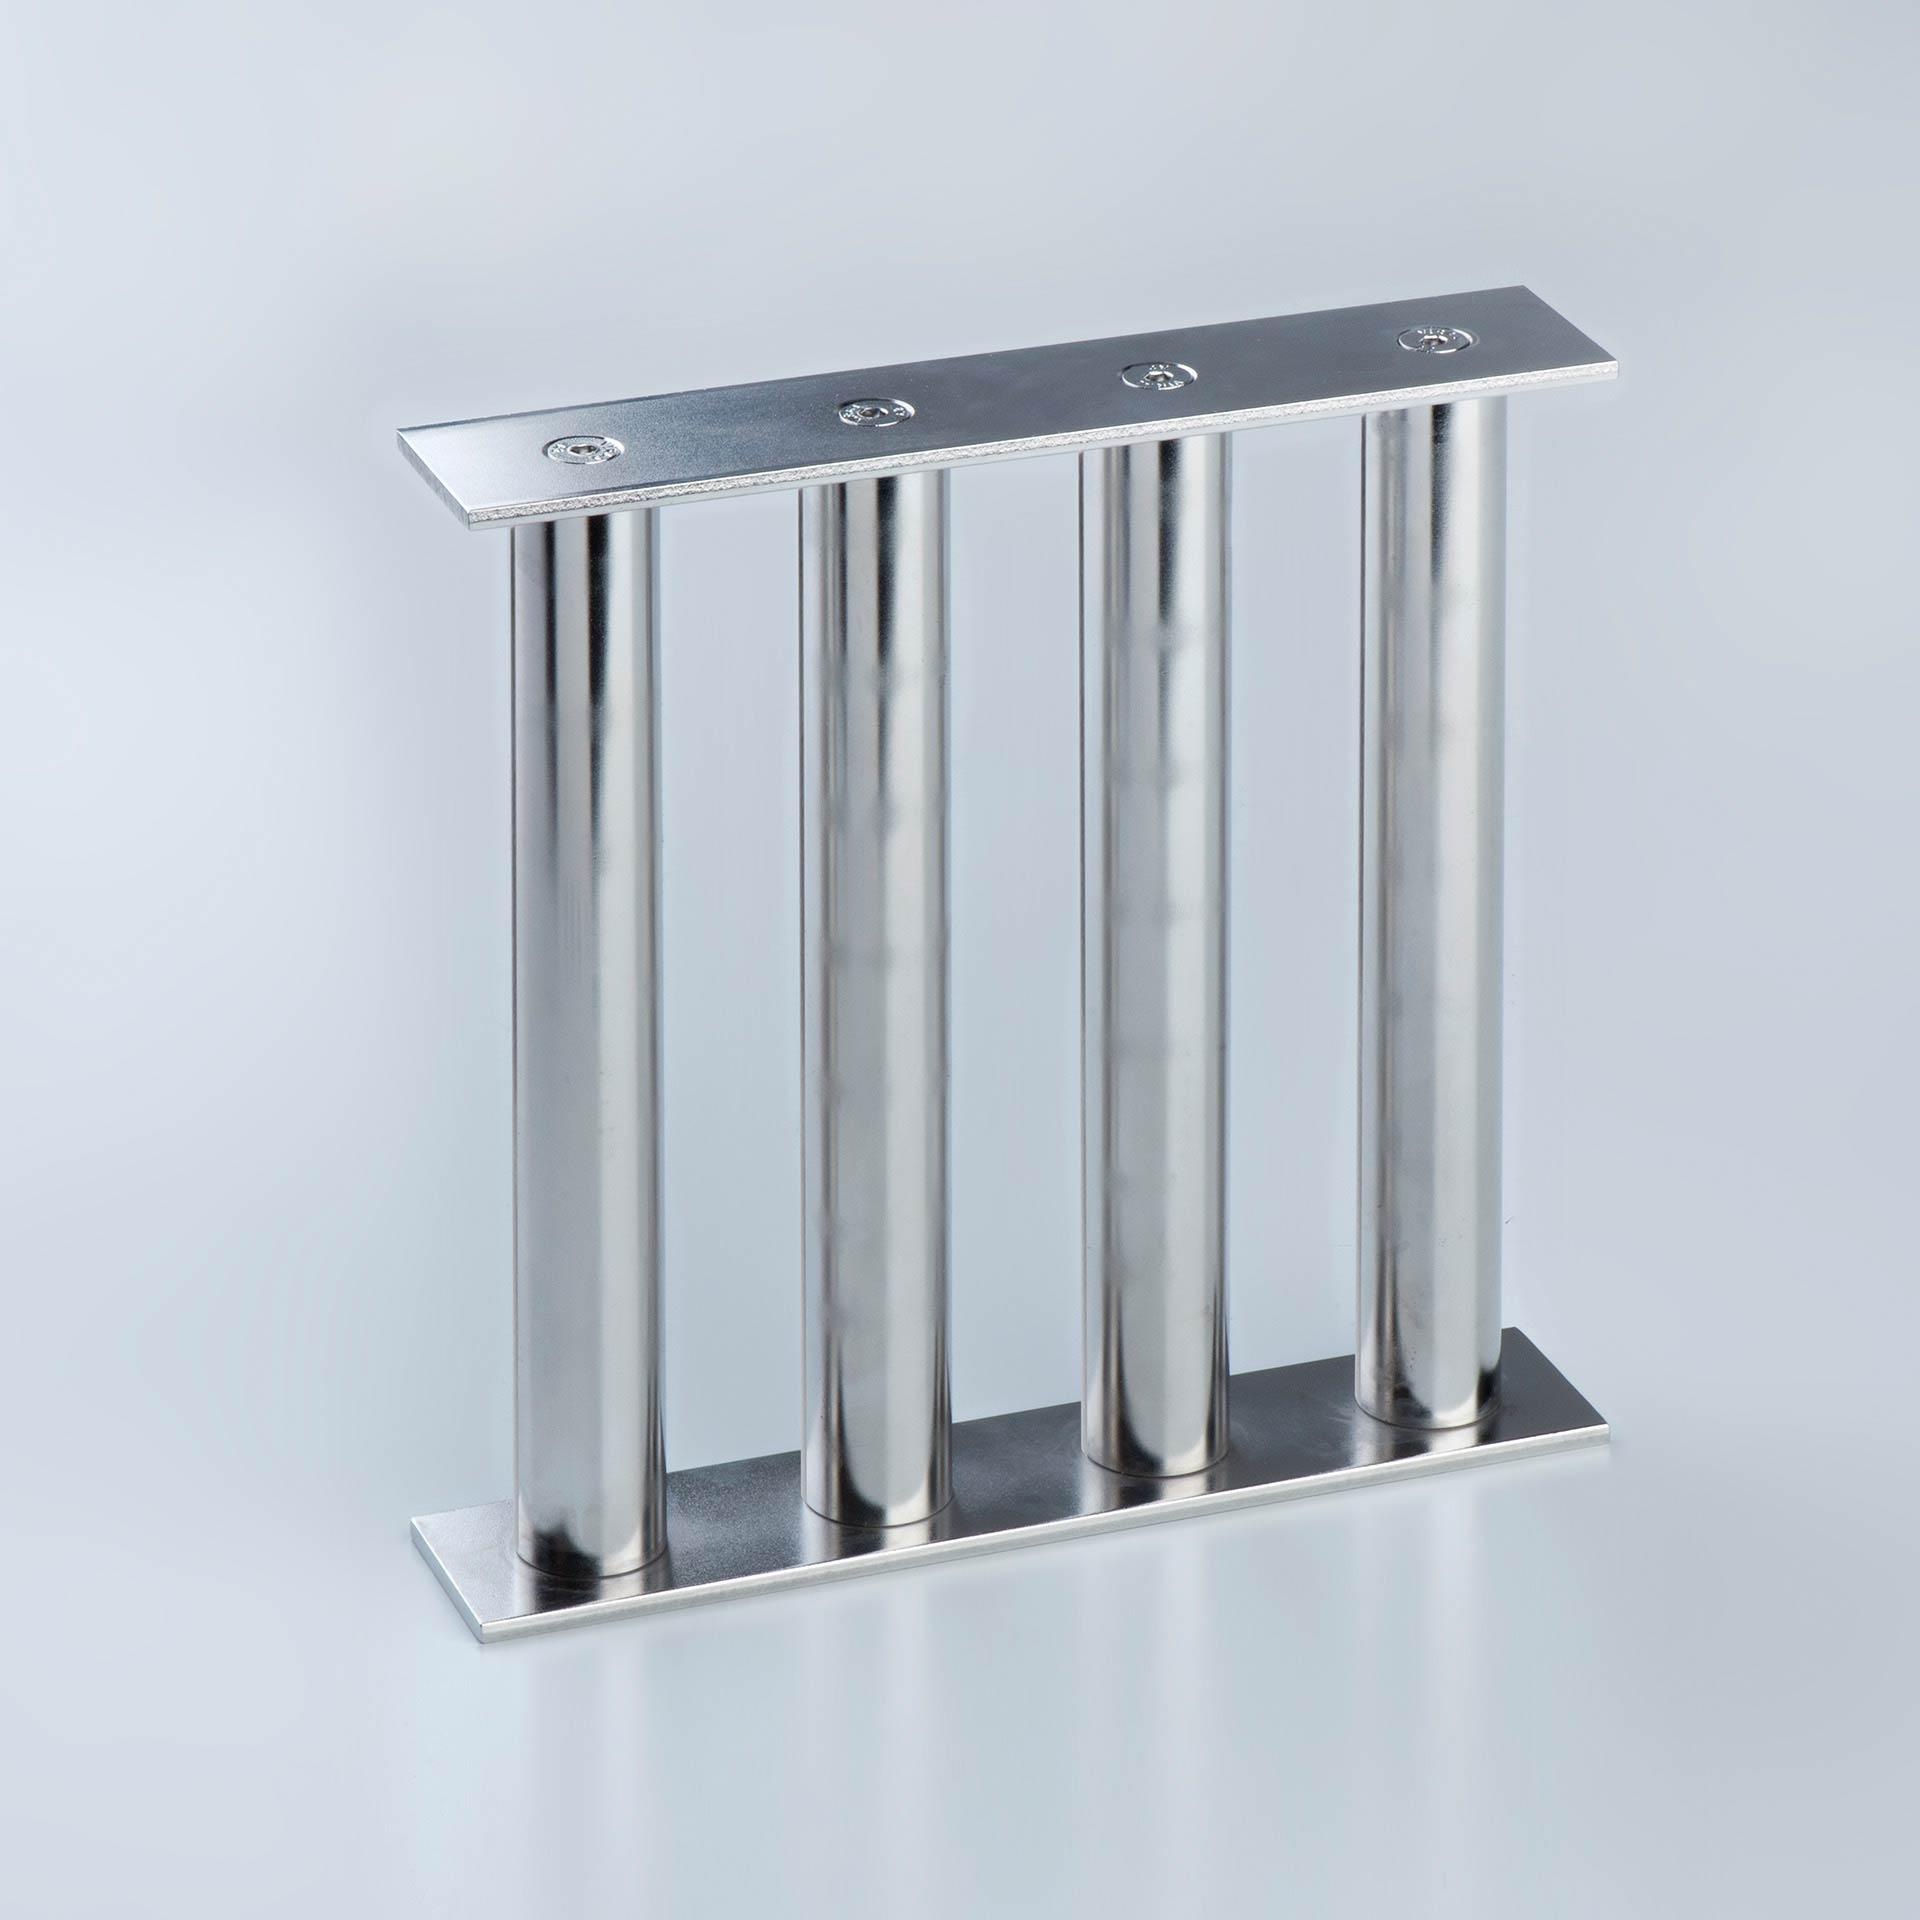 Filterstäbe, thyssenkrupp Magnettechnik